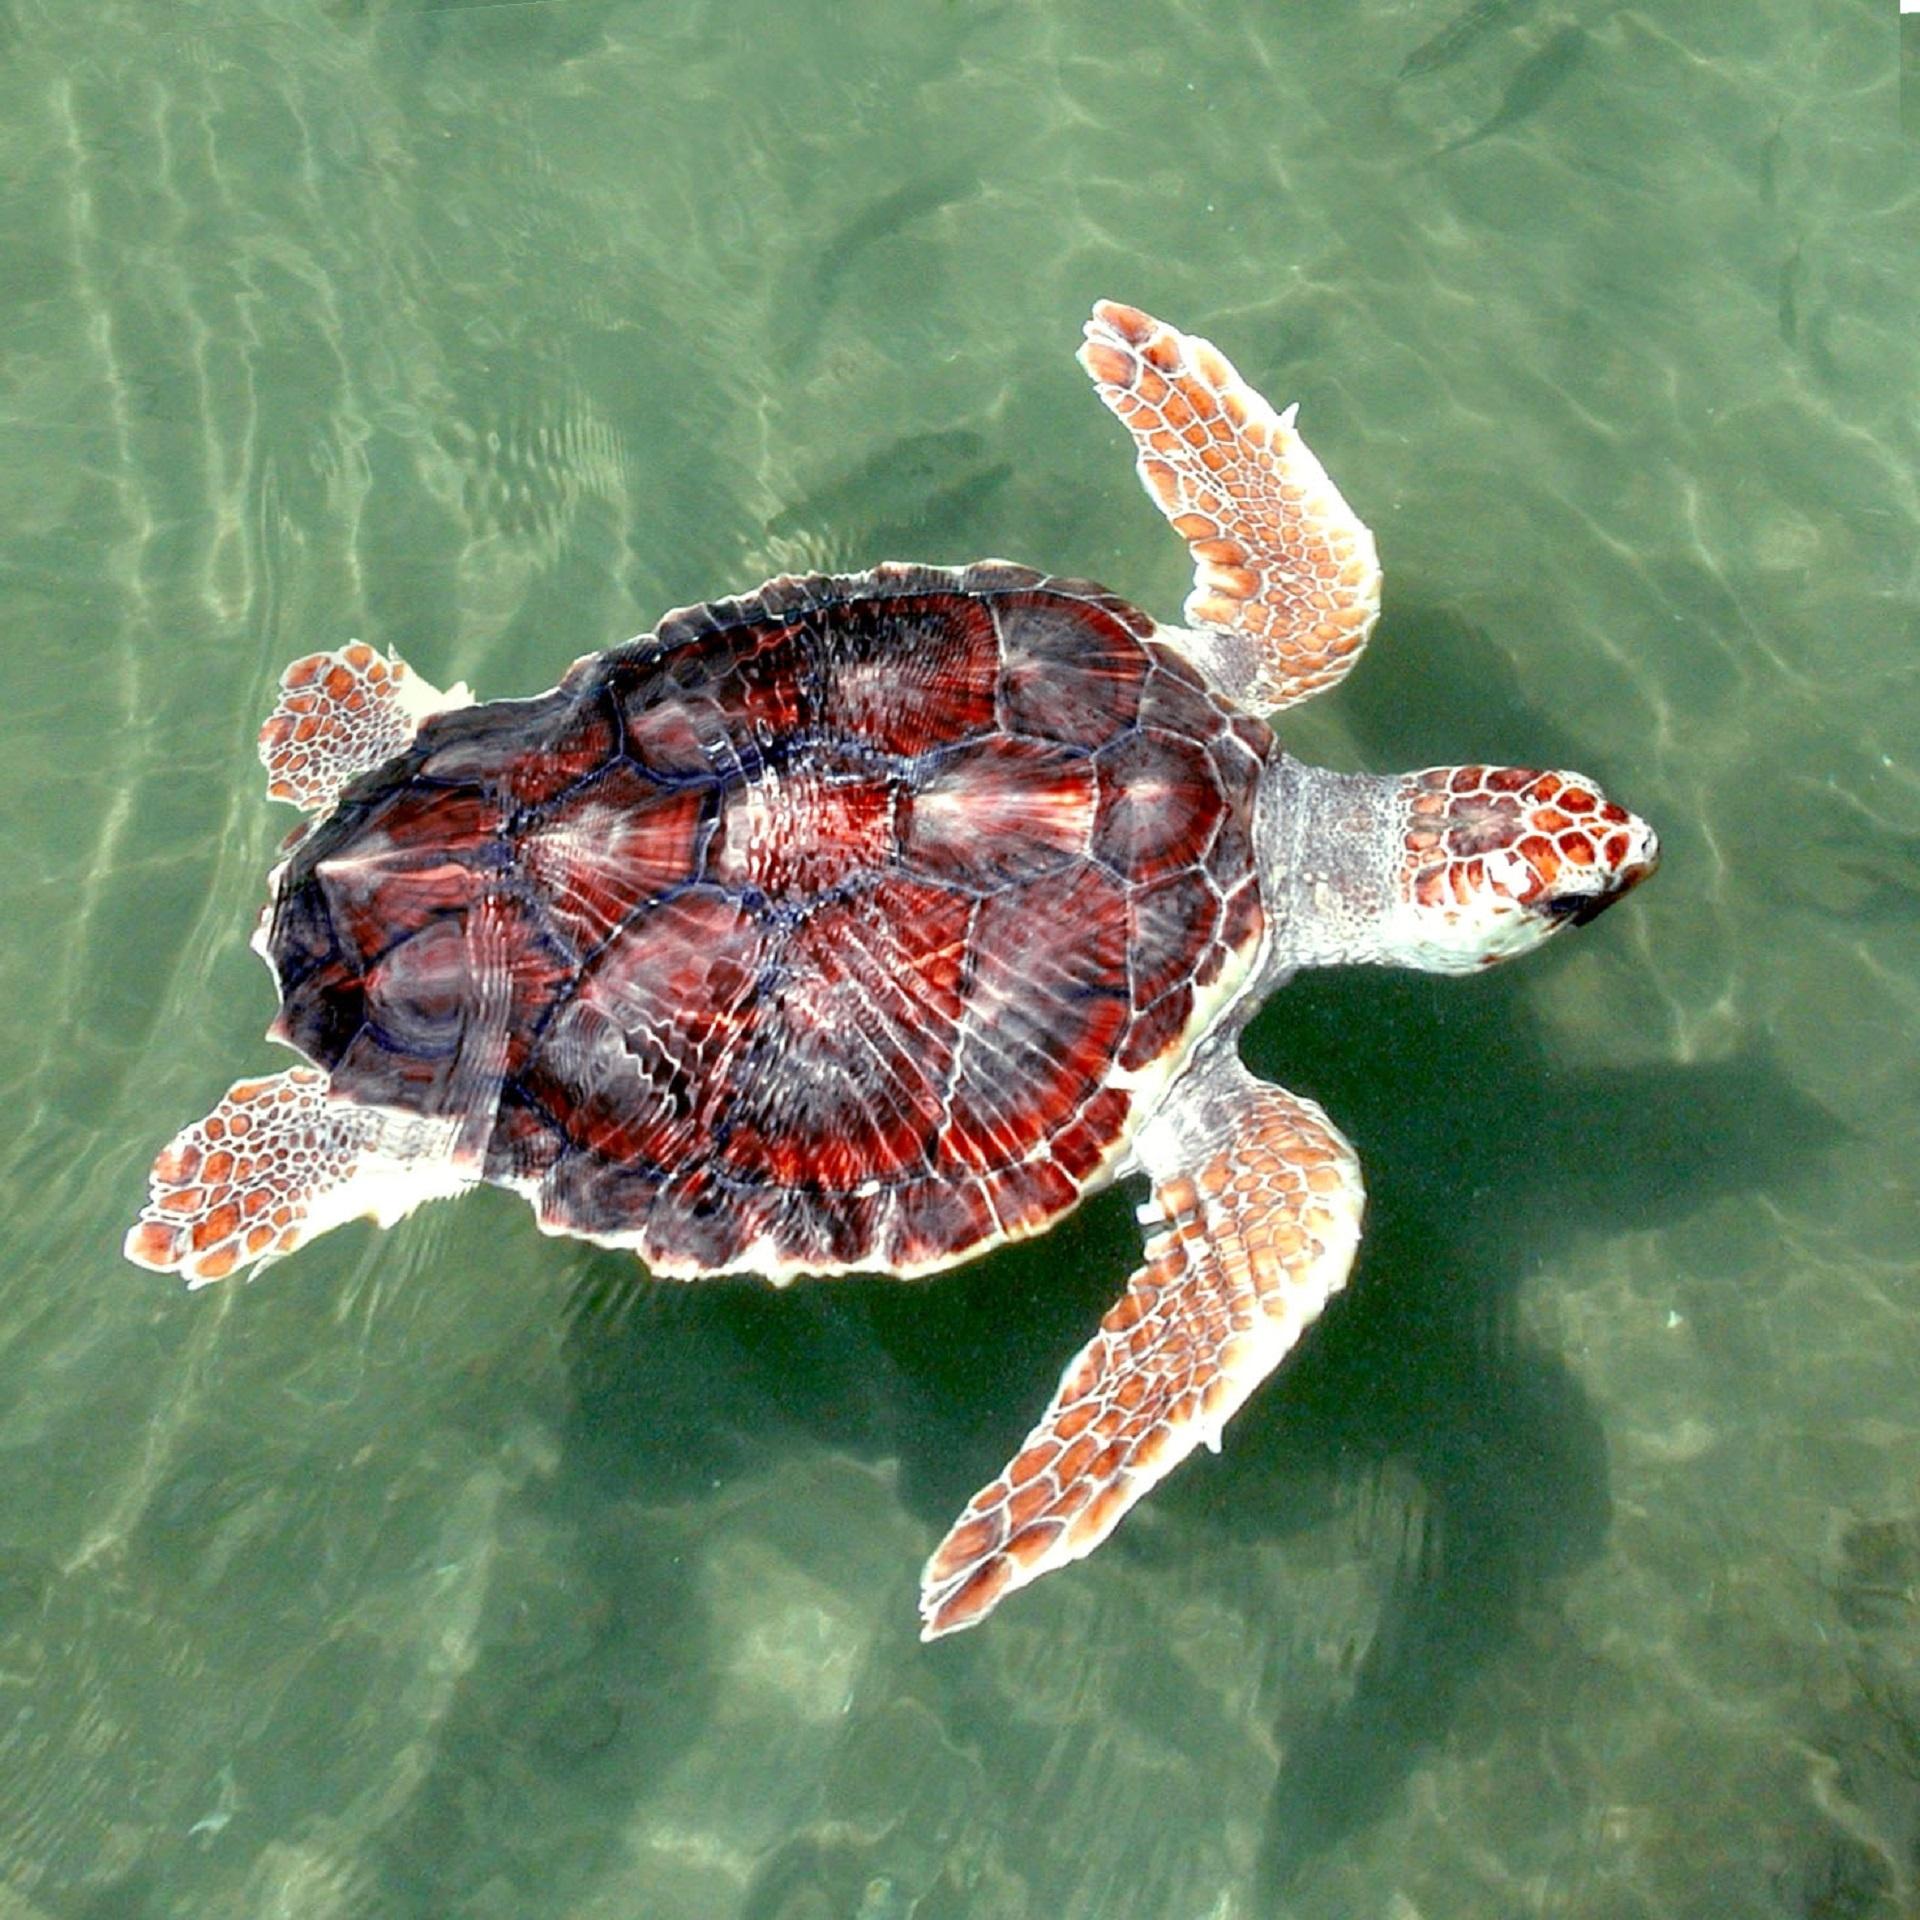 Turtle in the ocean photo